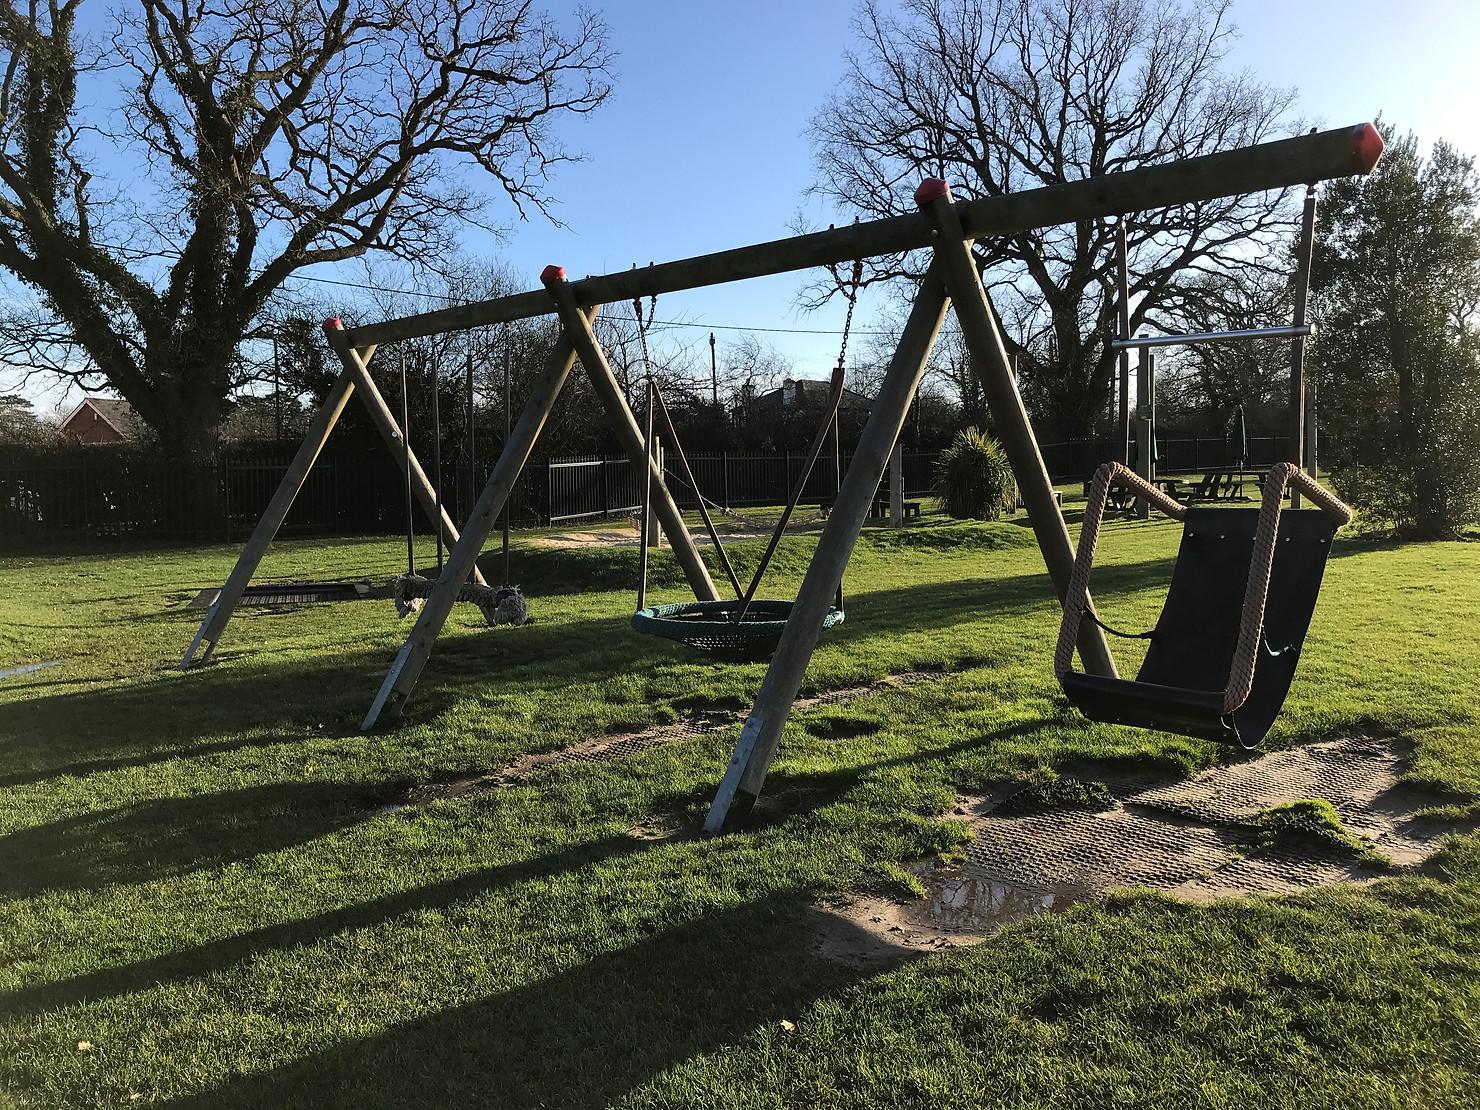 Locks Ride near Ascot Swings